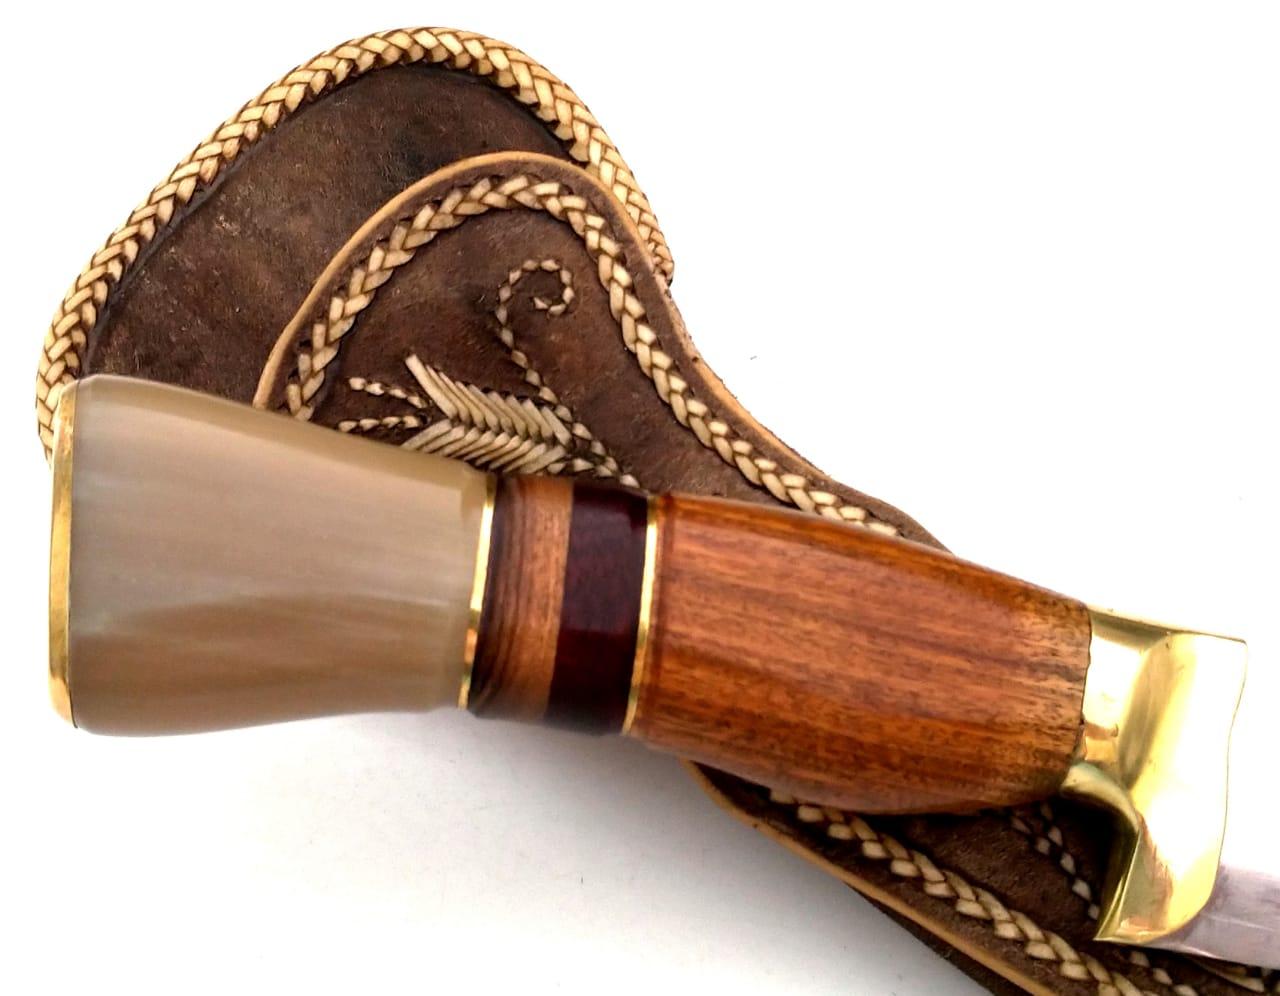 Faca artesanal língua de chimango 12 polegadas